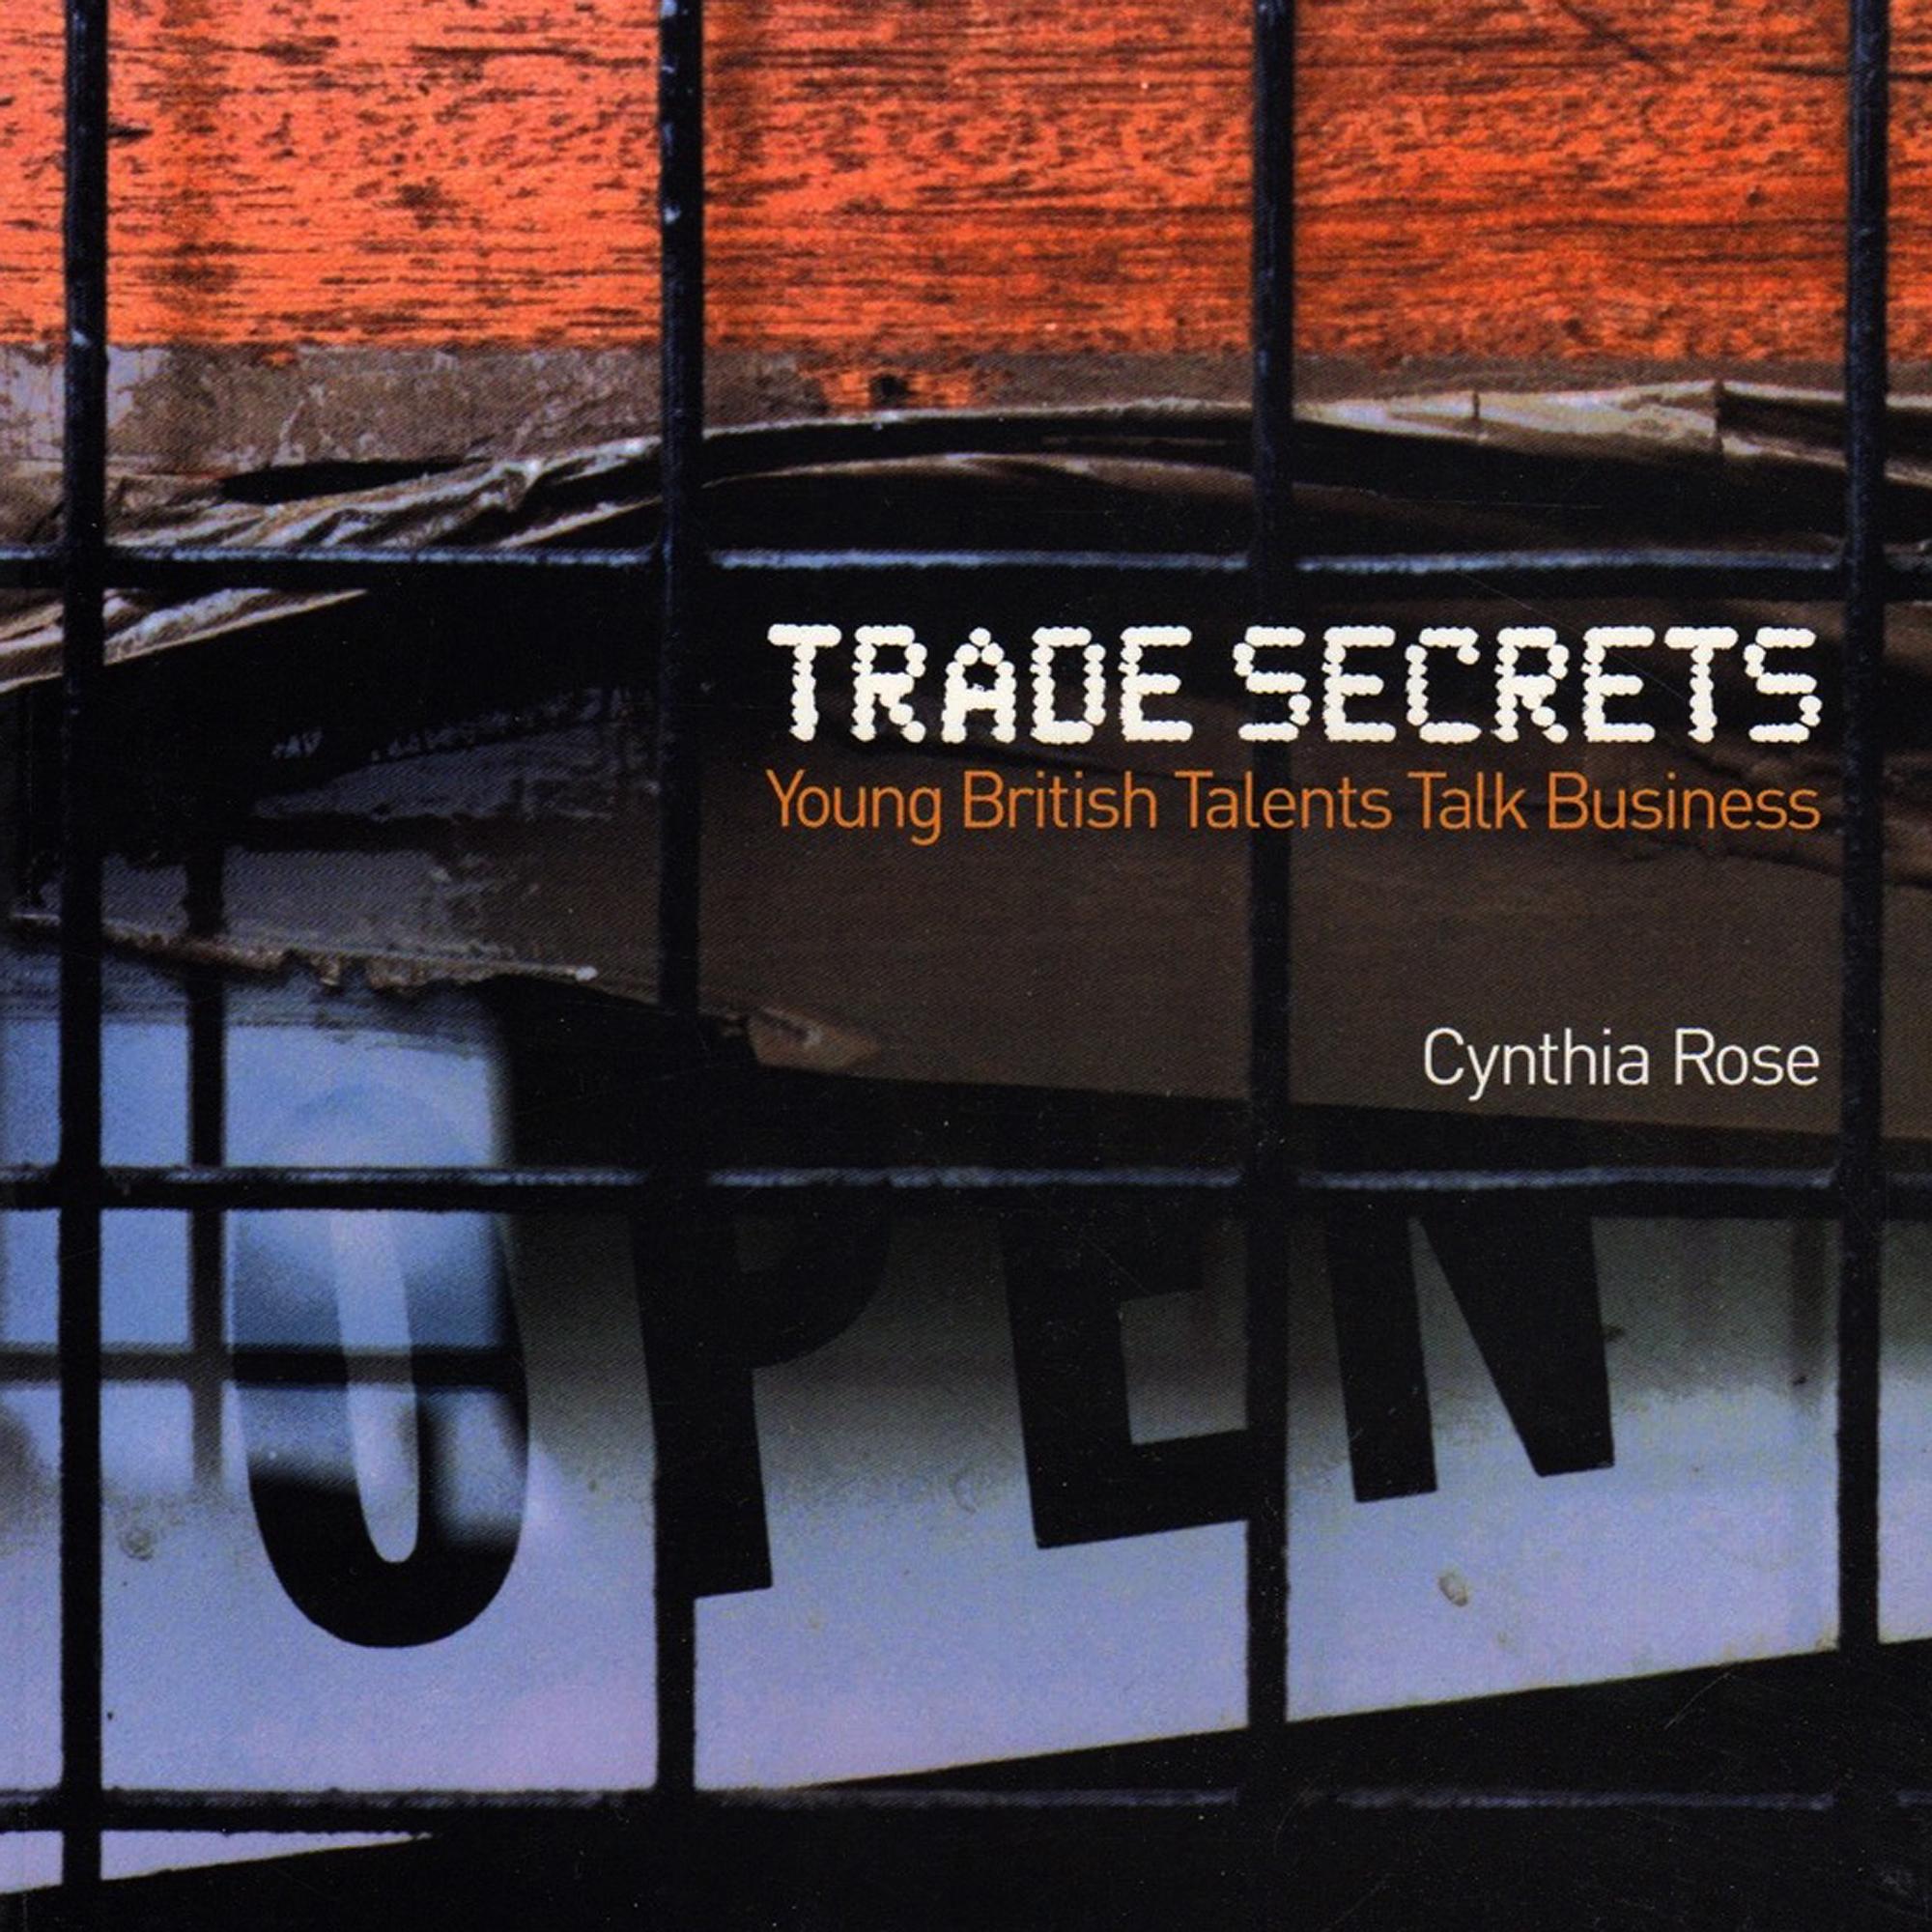 Books-TradeSecrets.jpg